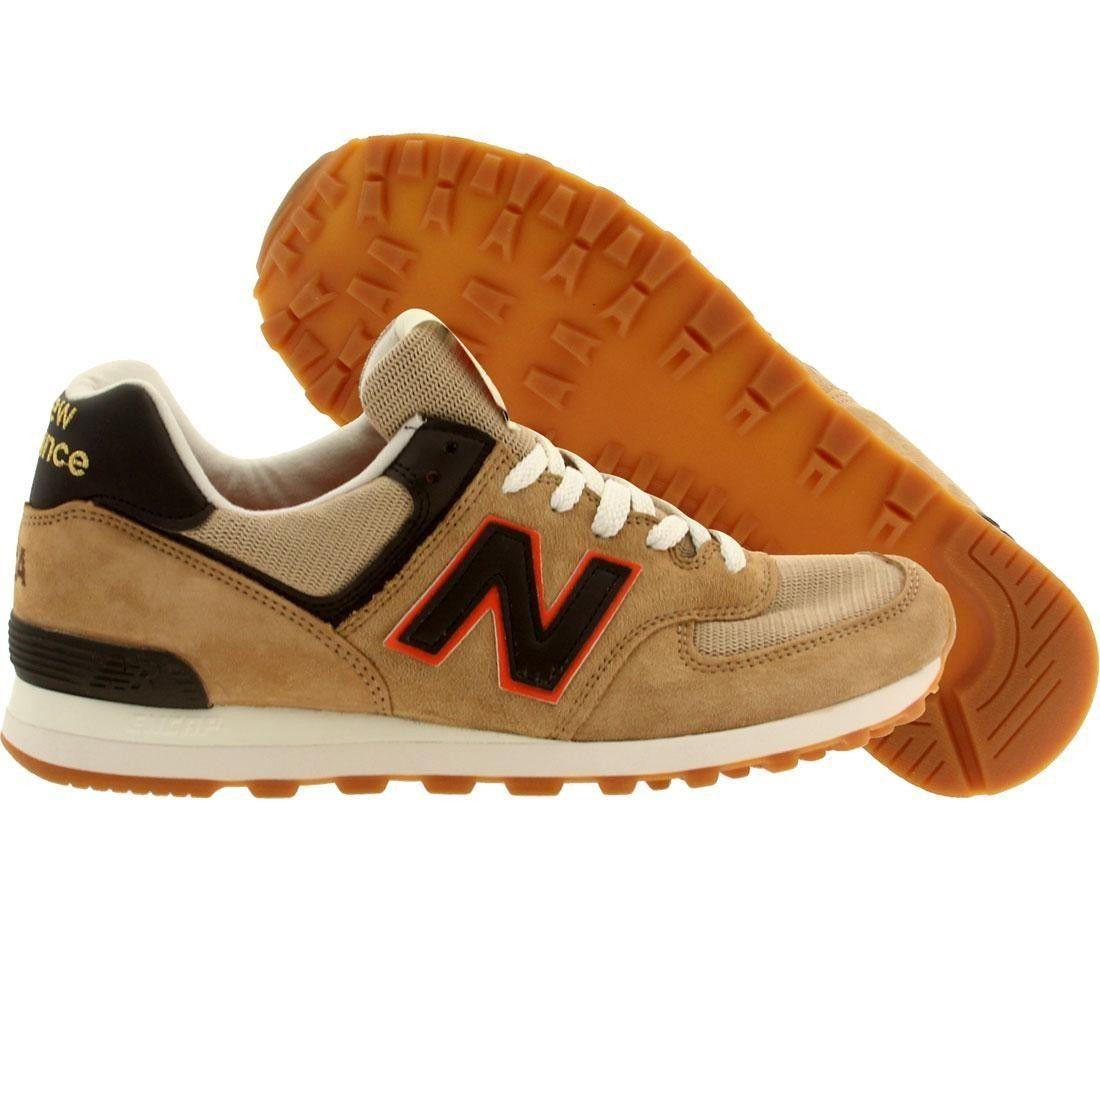 New Balance US574CBB Schuhe Tan Herren